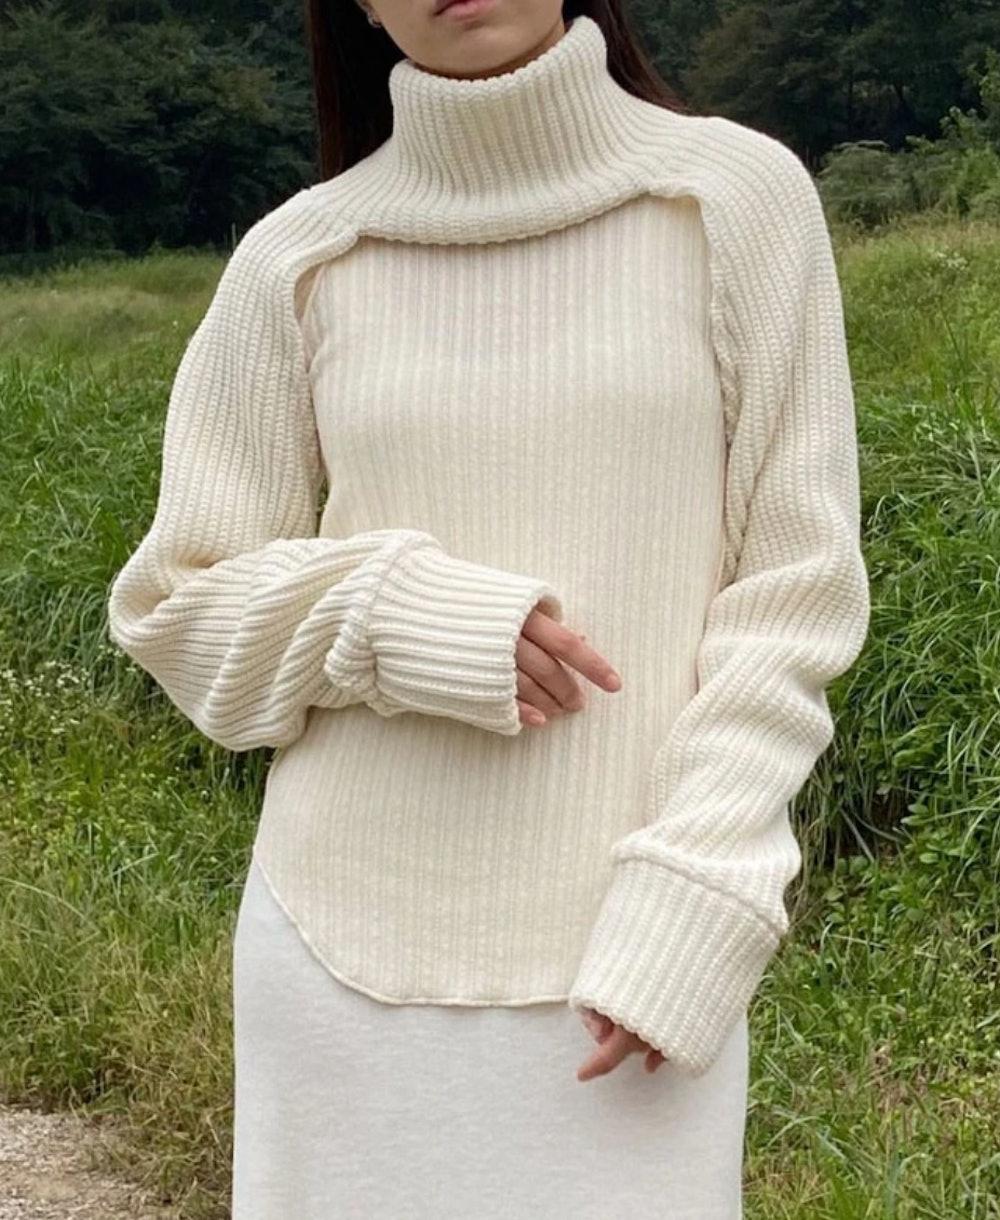 Turtleneck Knit Bolero Sleeve in Ivory